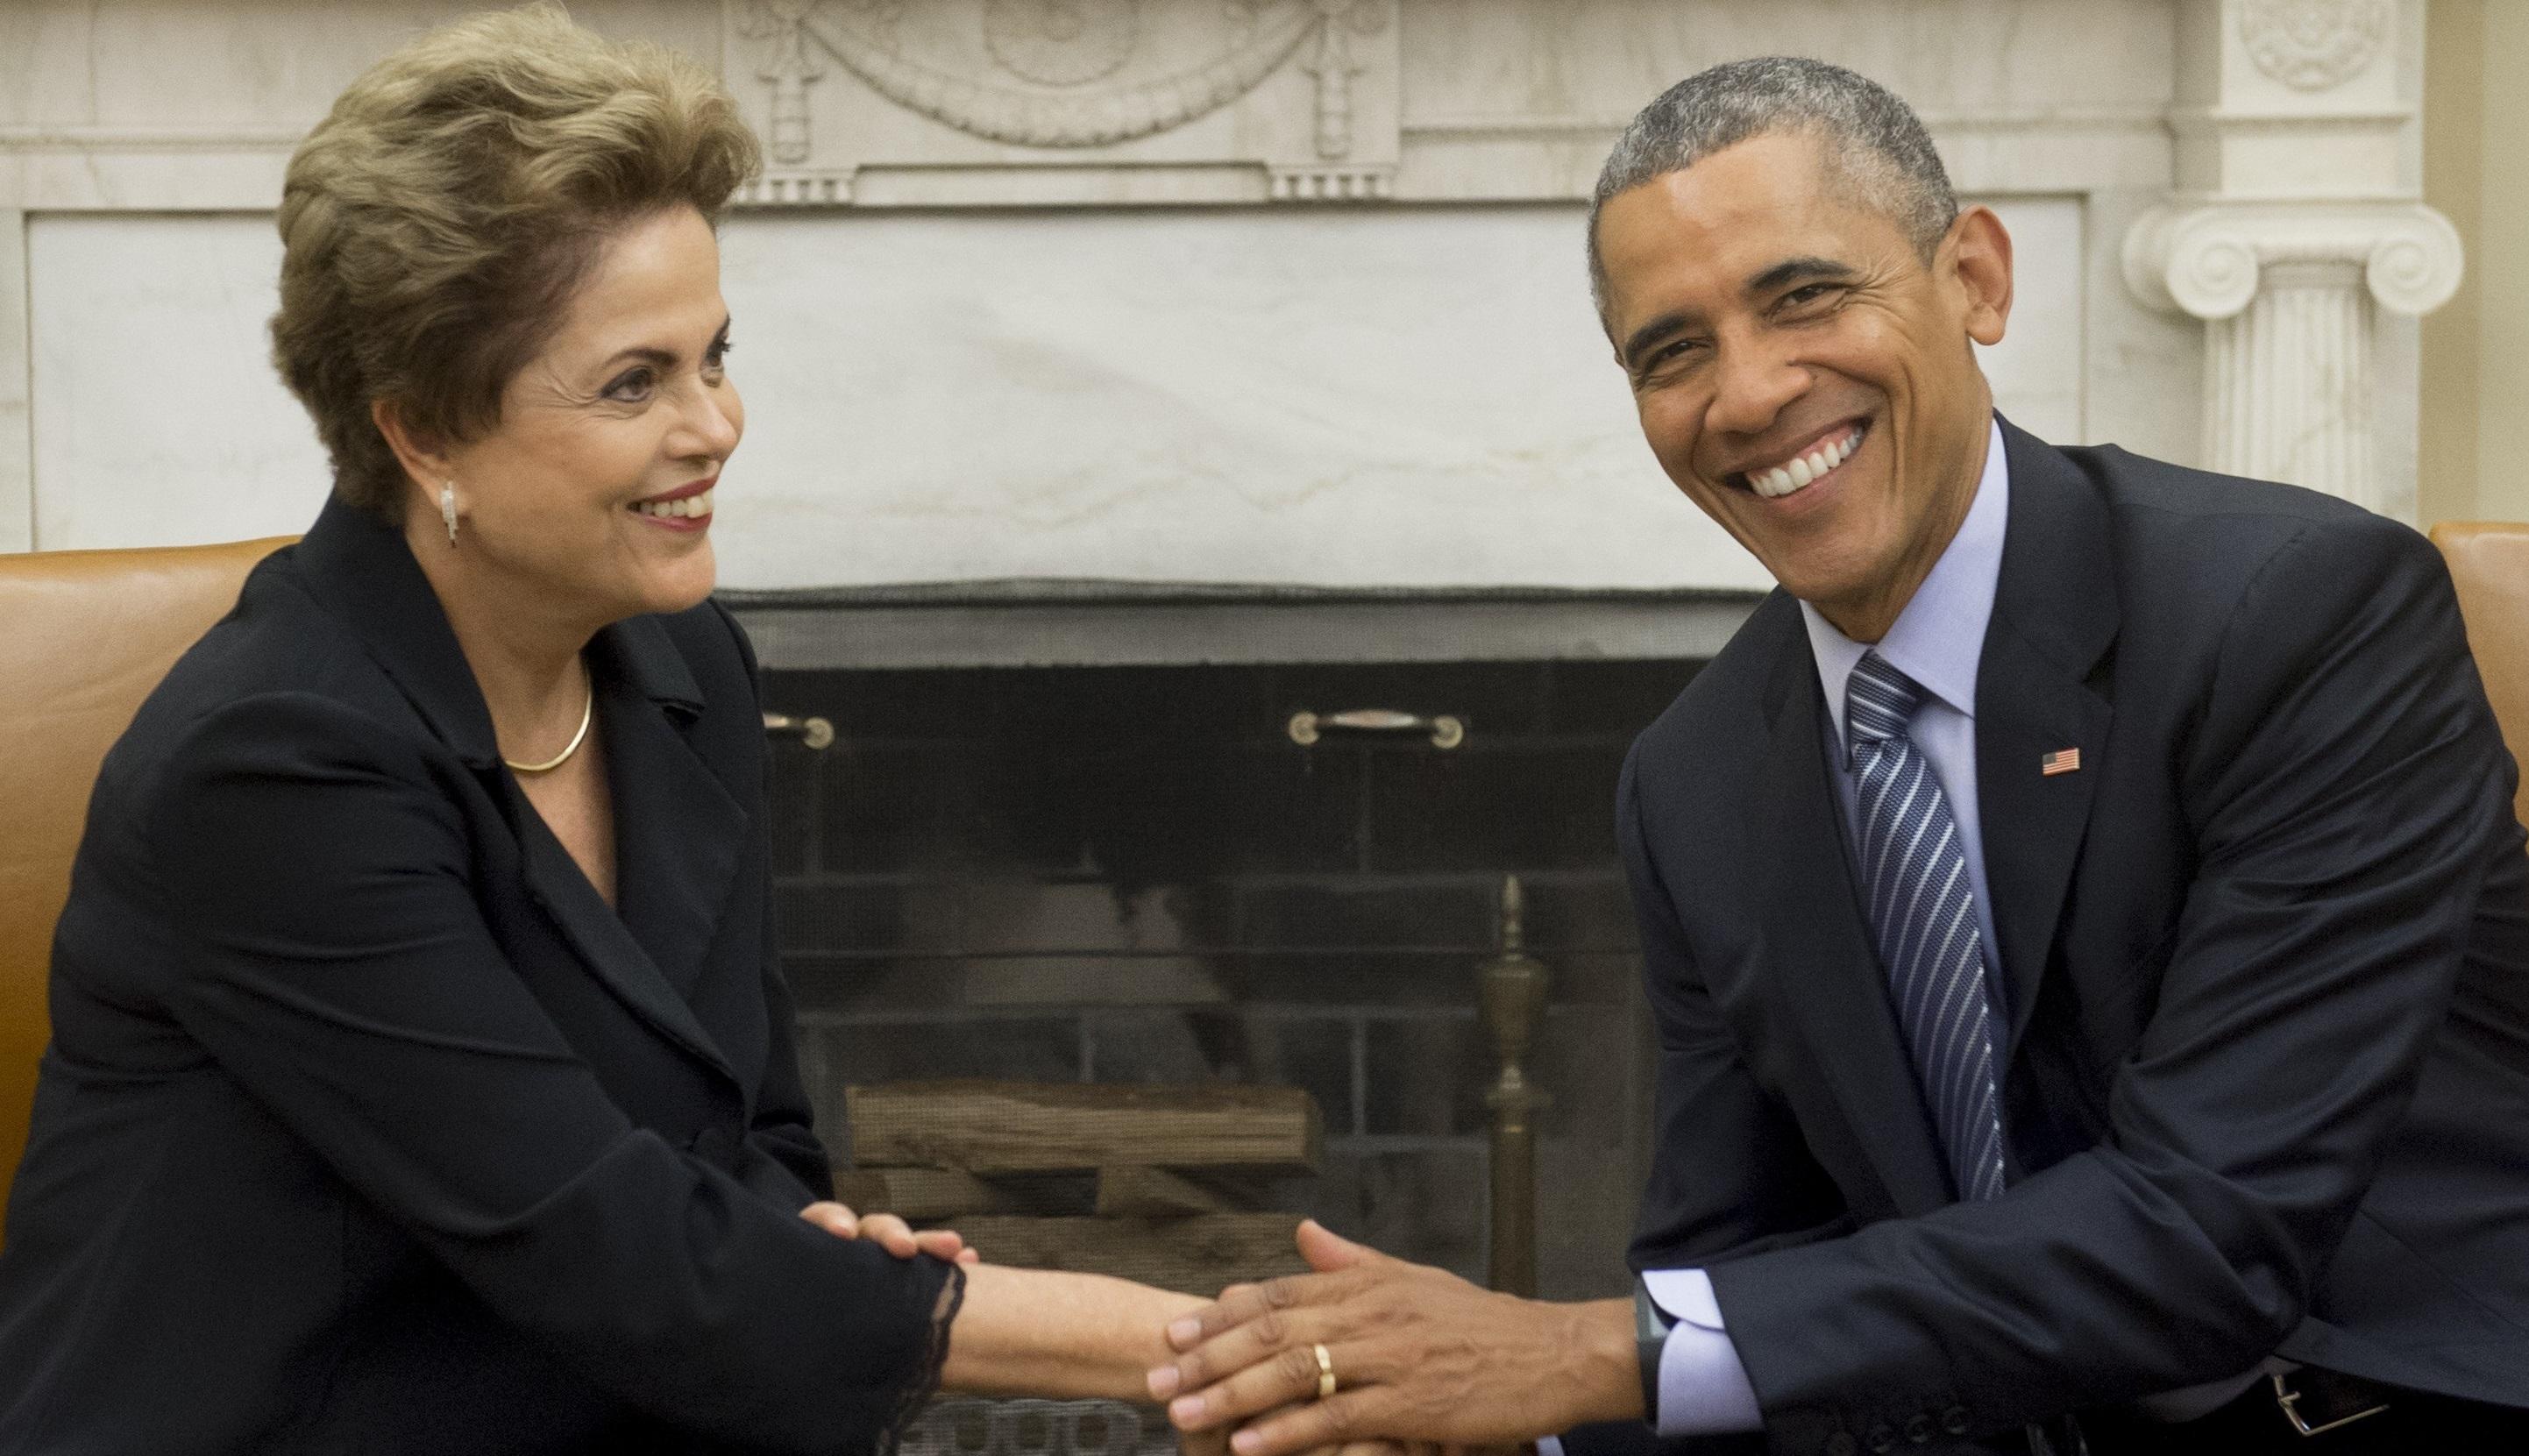 Obama rousseff ok - Bureau president americain ...